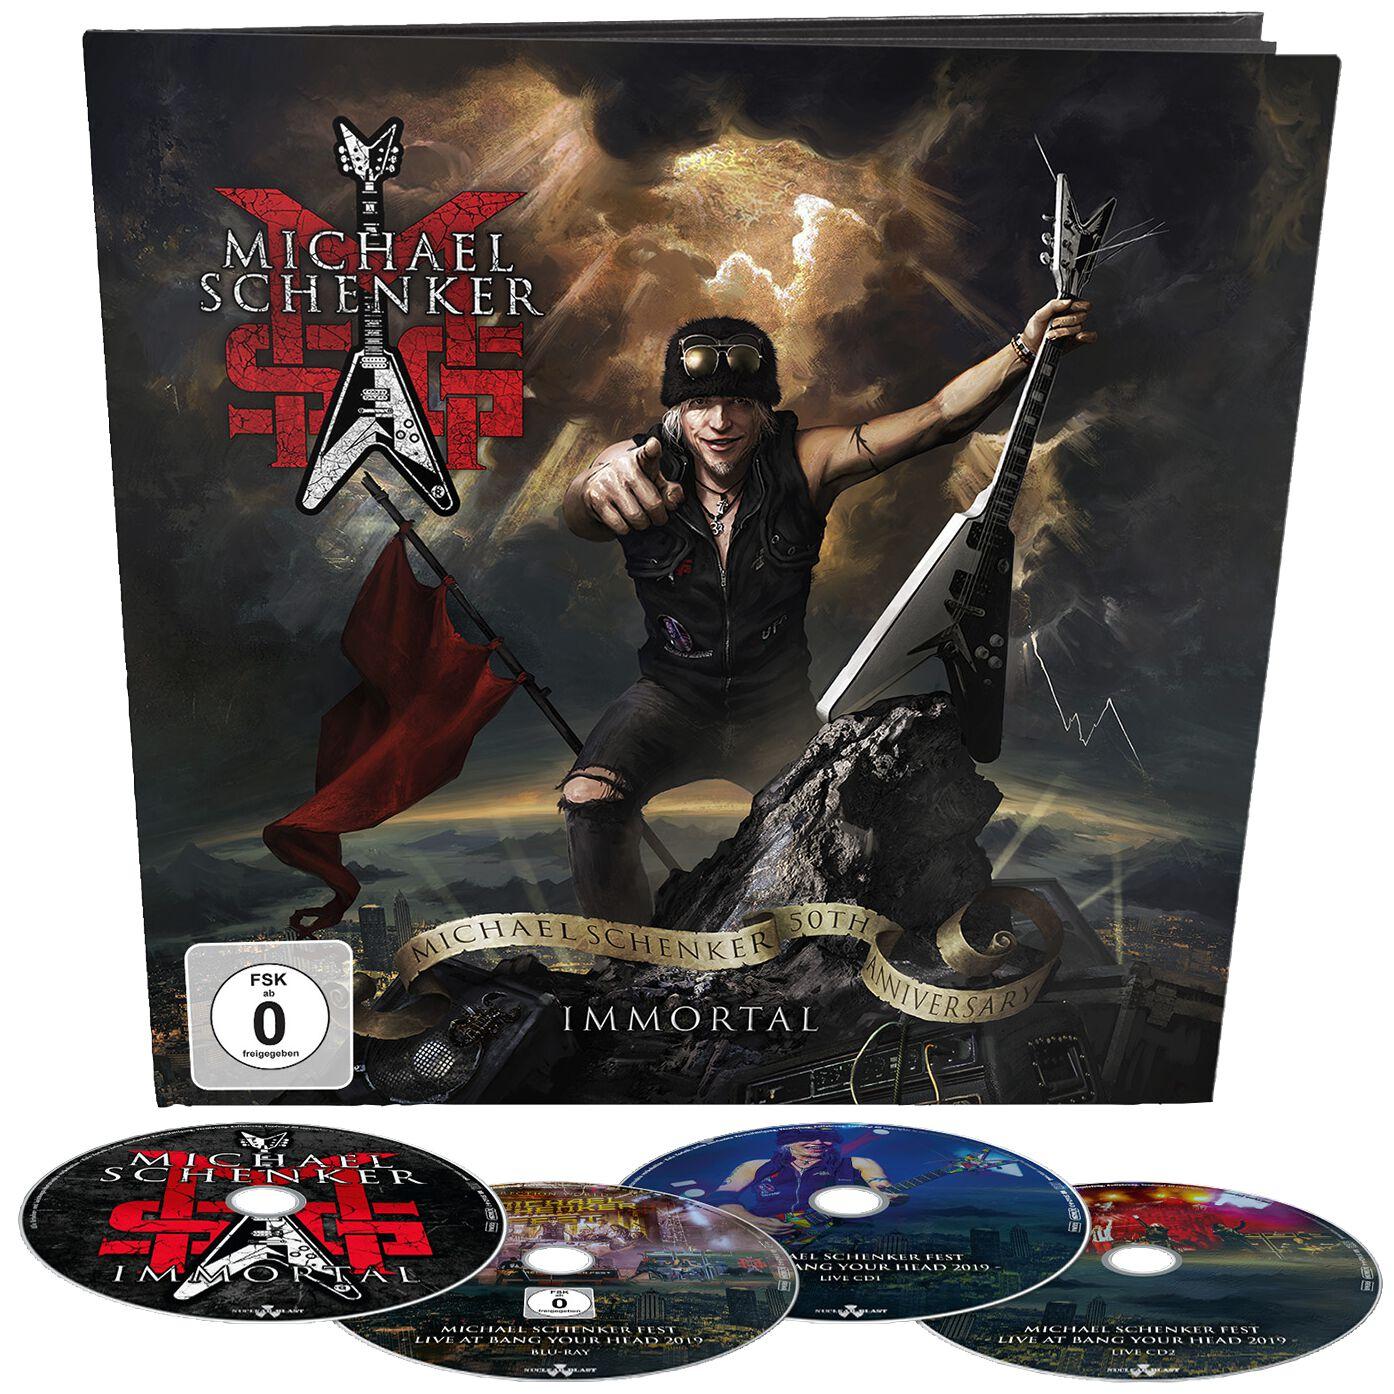 Image of Michael Schenker Group Immortal 3-CD & Blu-ray Standard